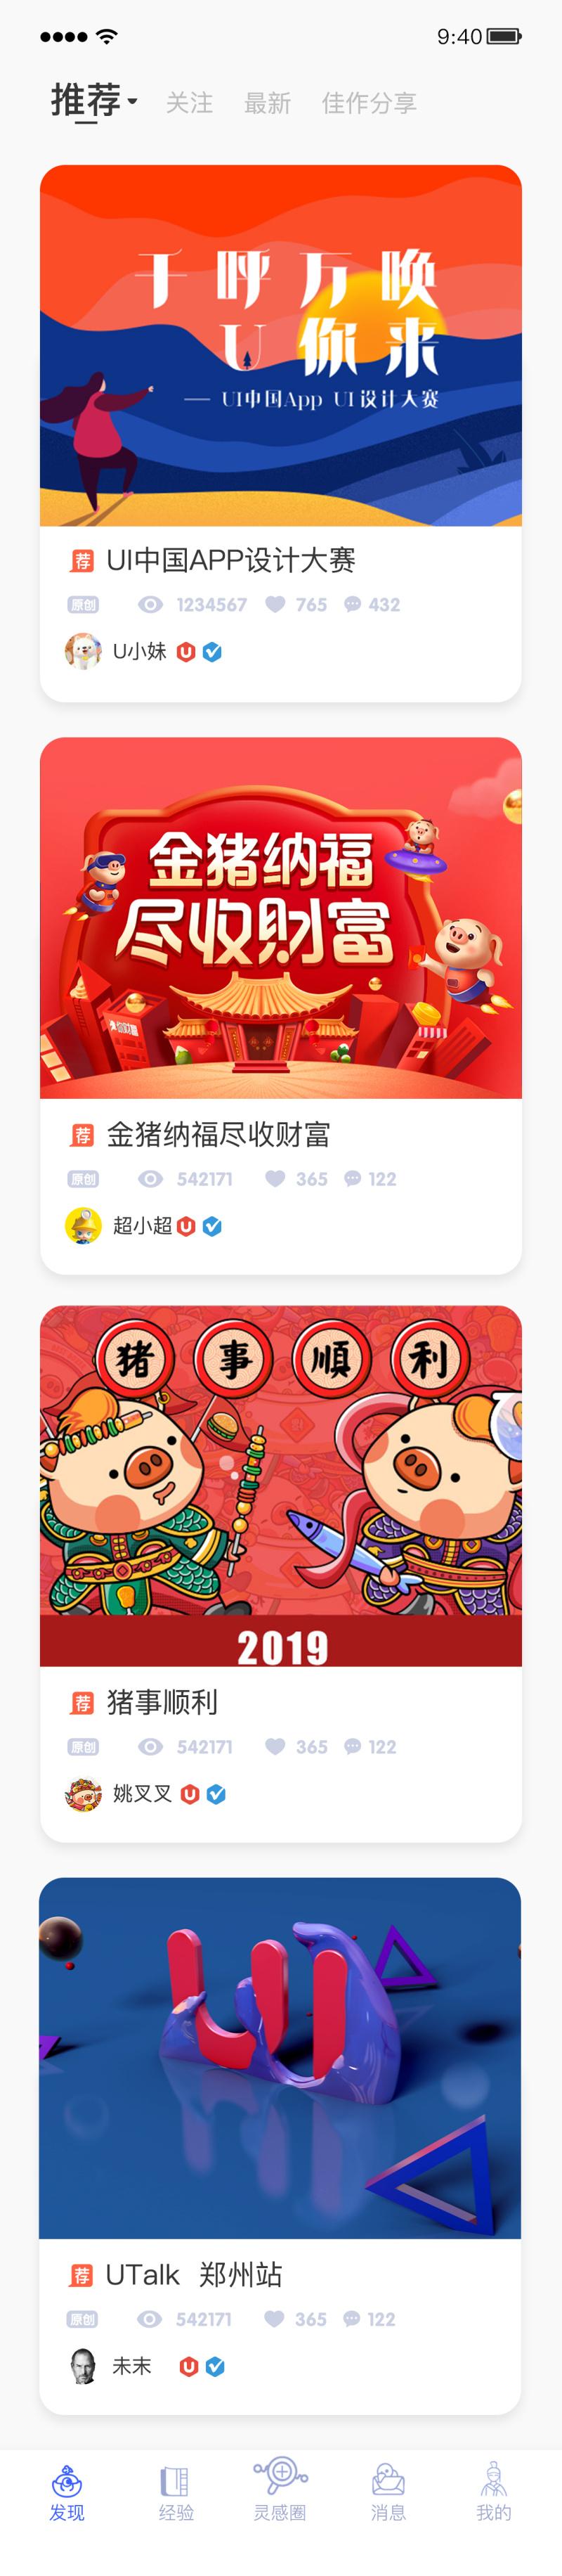 UI中国app移动版提案